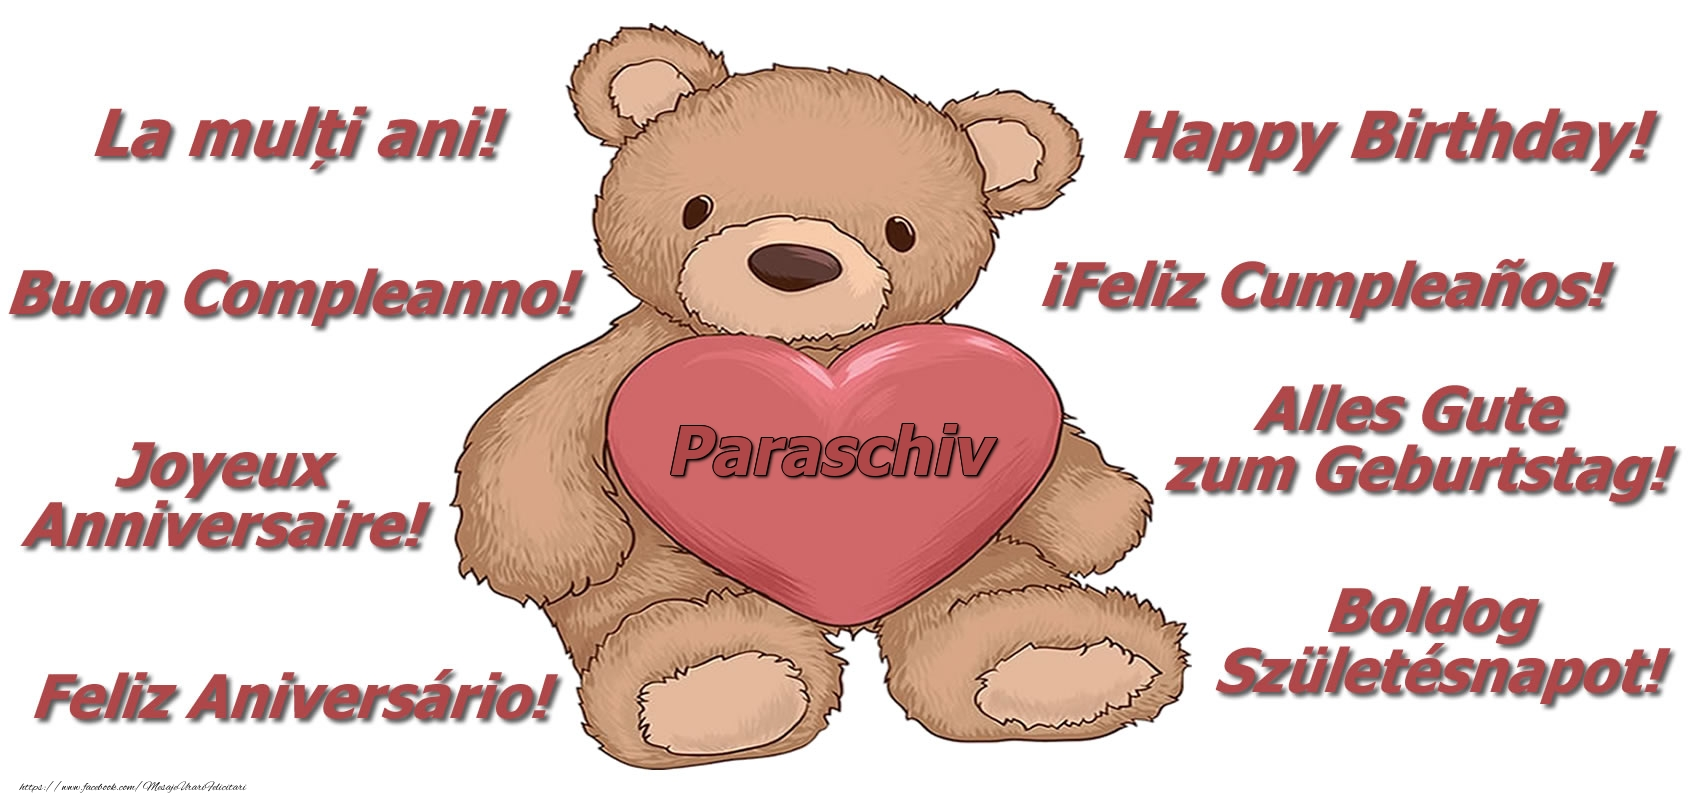 Felicitari de zi de nastere - La multi ani Paraschiv! - Ursulet